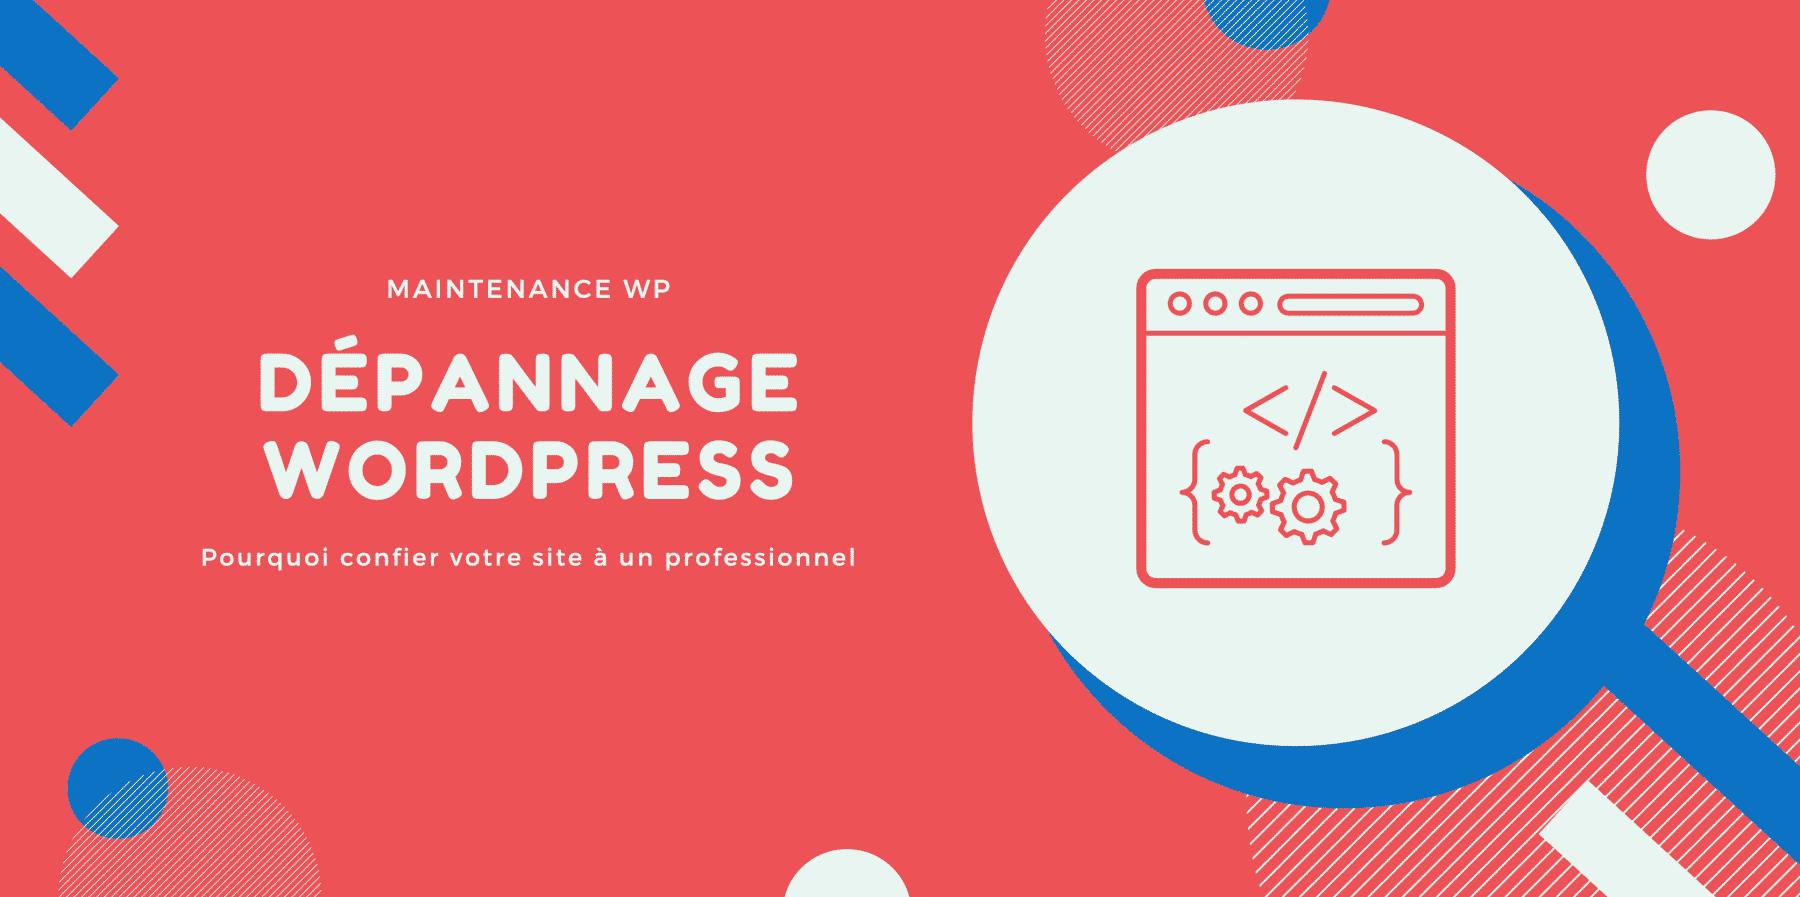 Dépannage WordPress - Maintenance WP